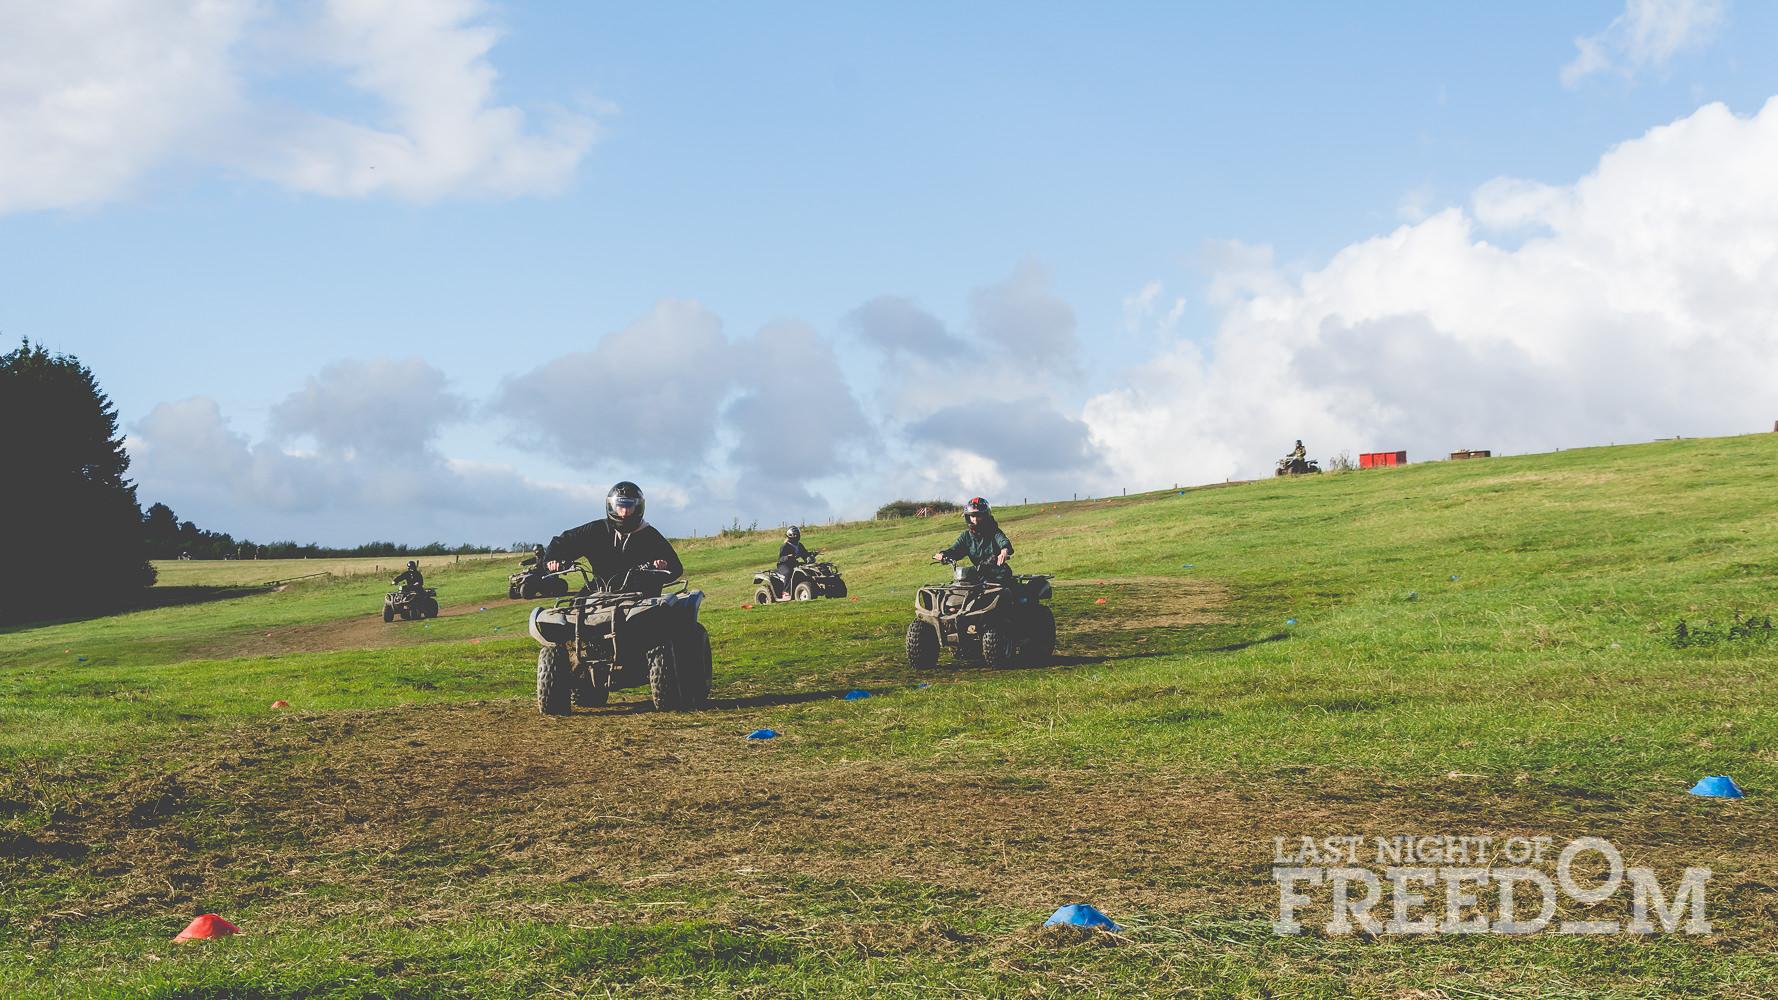 LNOF staff steering quad bikes around a field